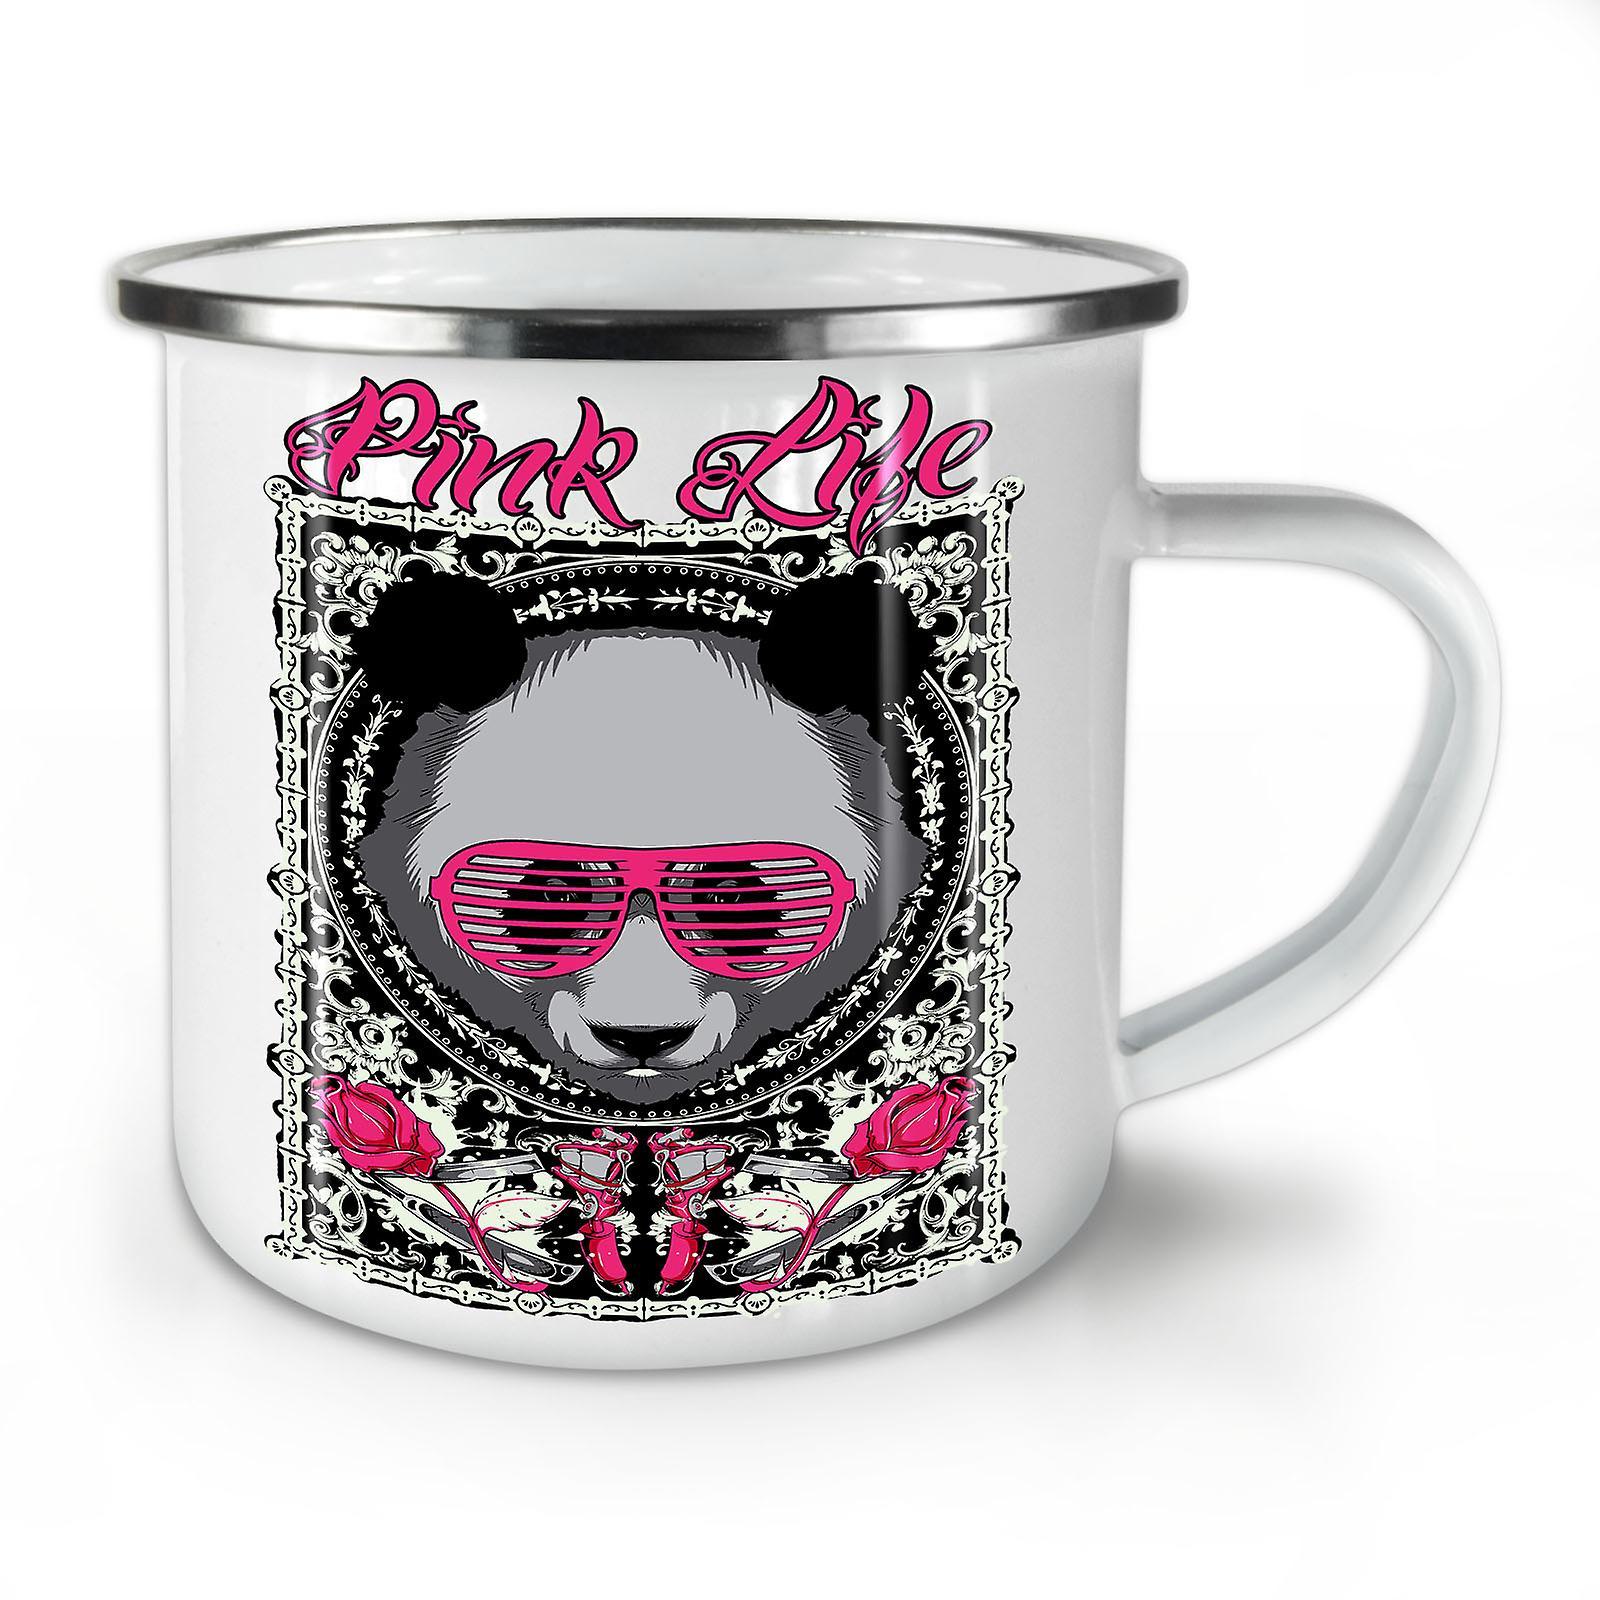 La OzWellcoda Vie Nouveau Mug10 Panda Animal Whitetea Café Émail Rose 0XOk8nwP